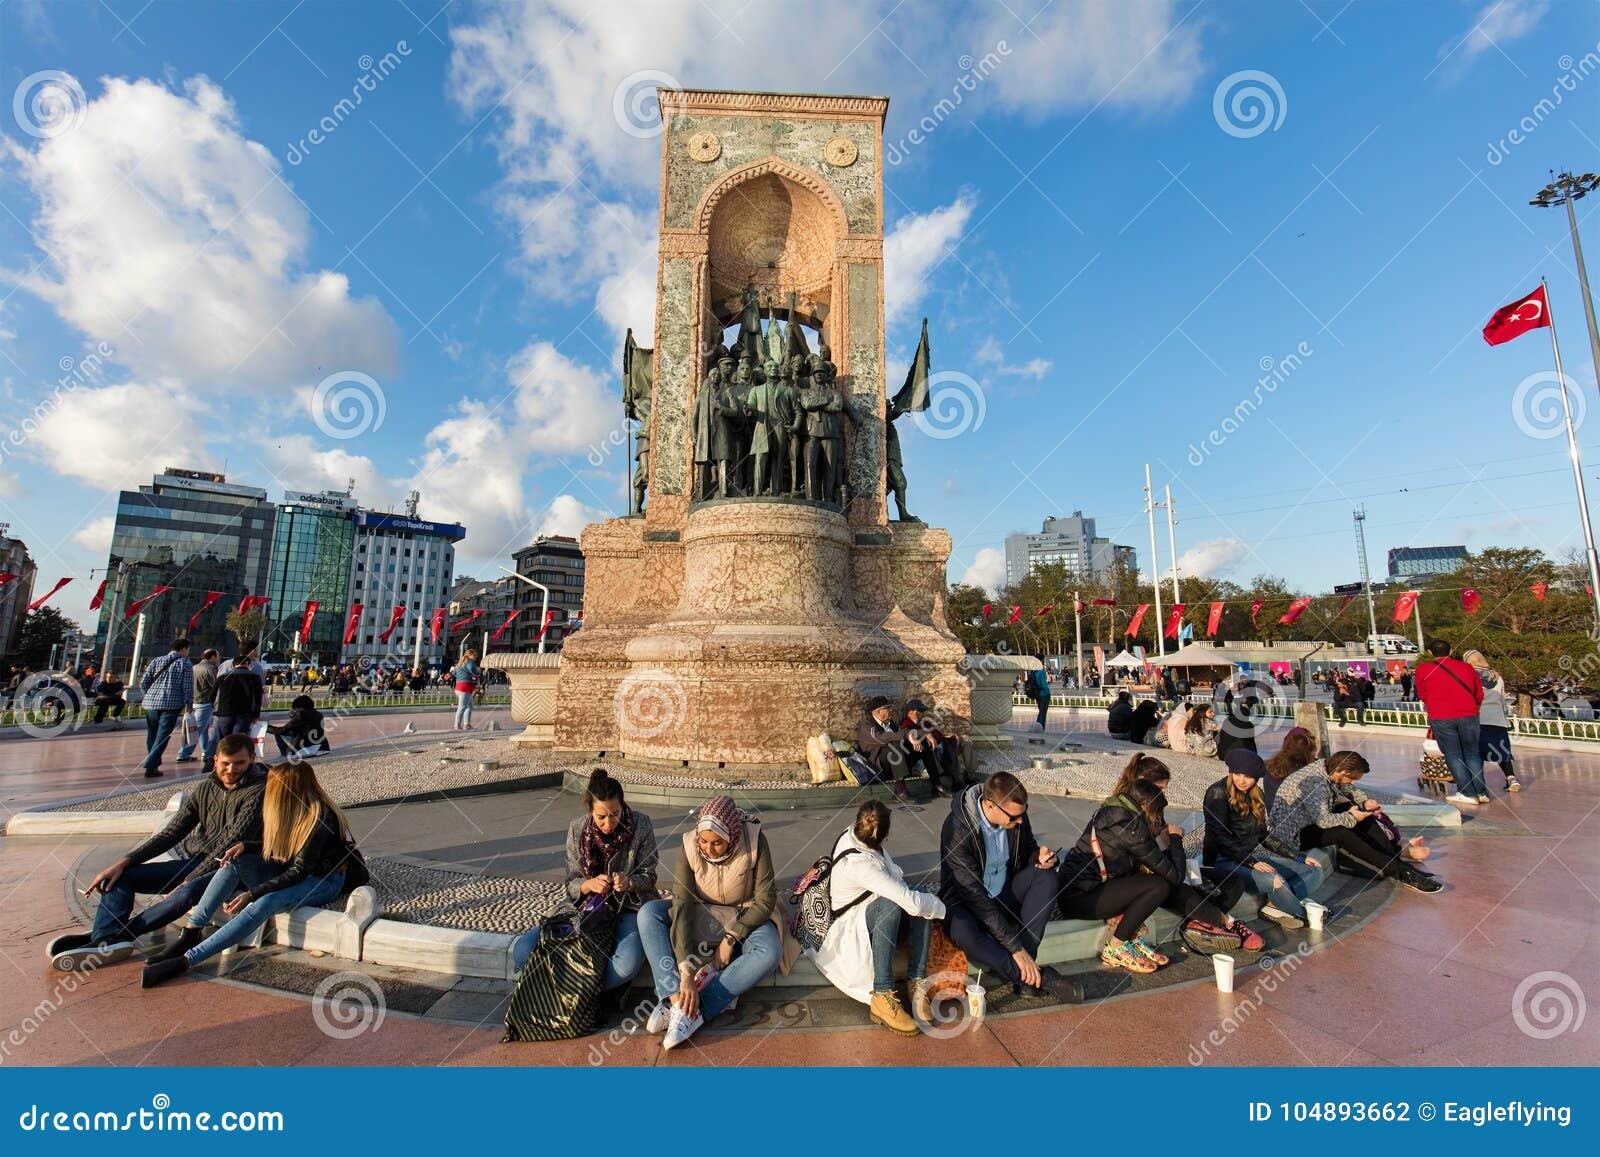 Curious monument in Taksim Square (Istanbul) 80